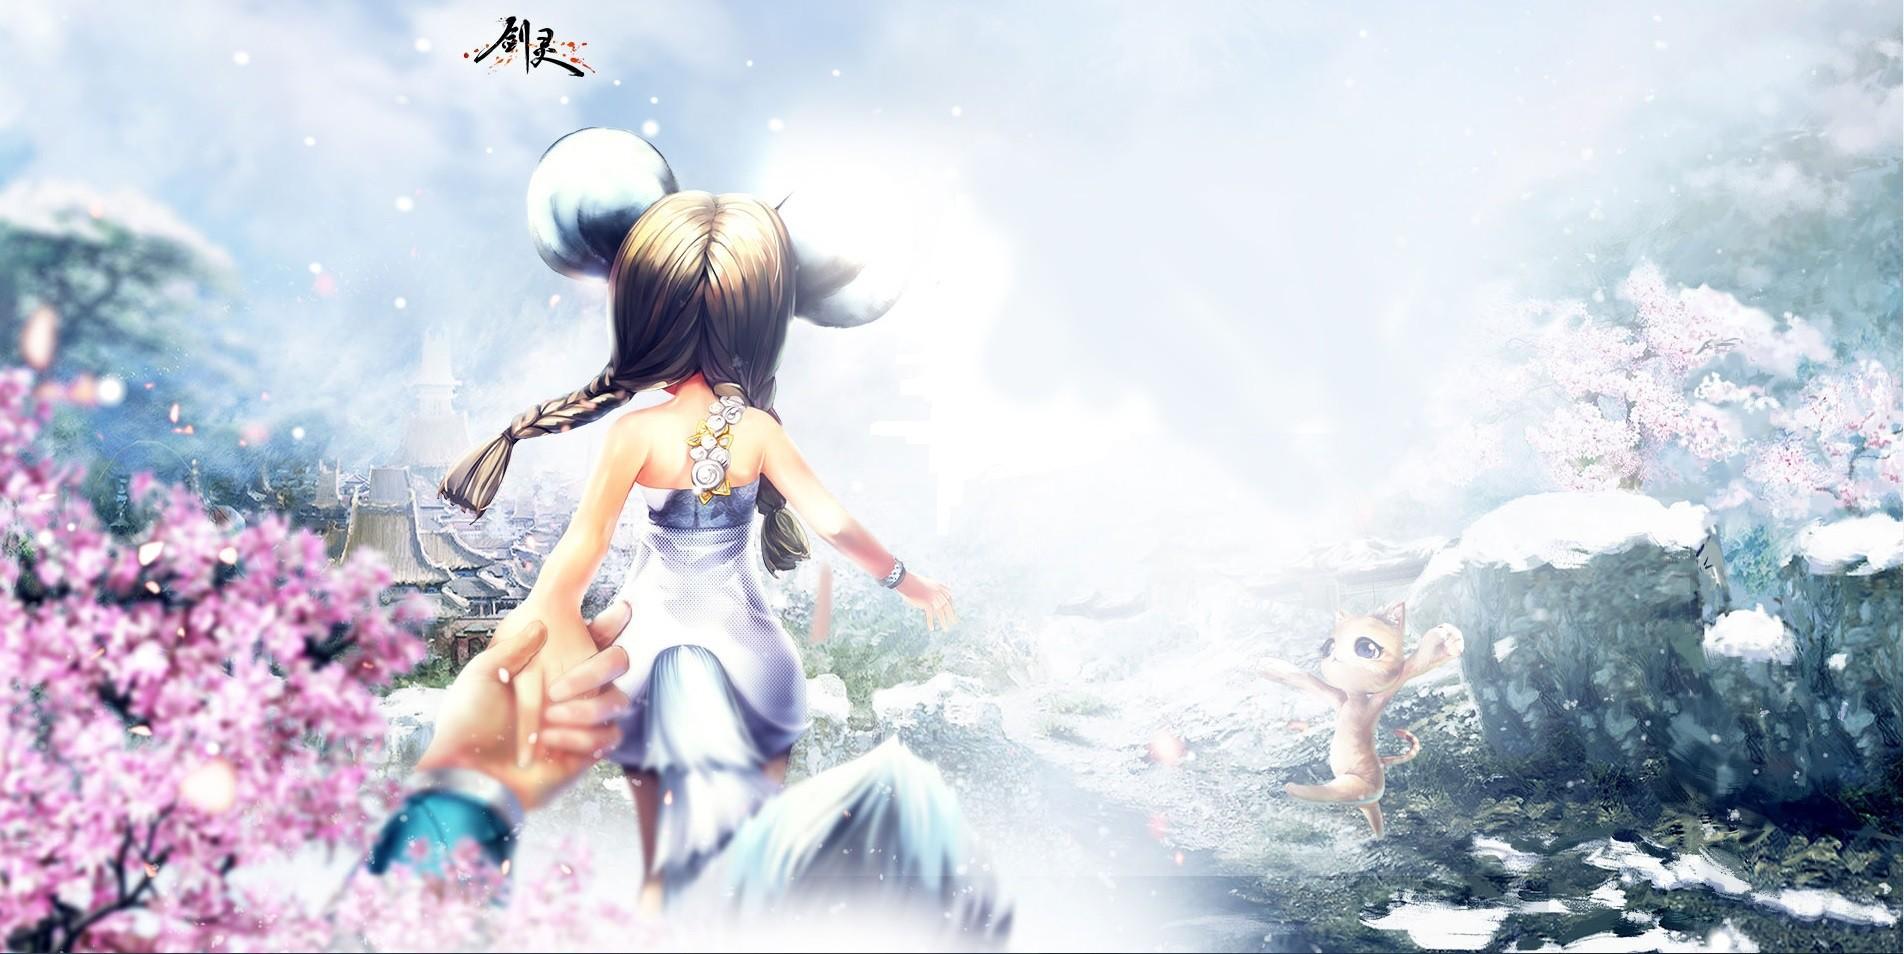 Wallpaper Anime Pc Gaming Blade Soul Mythology Season